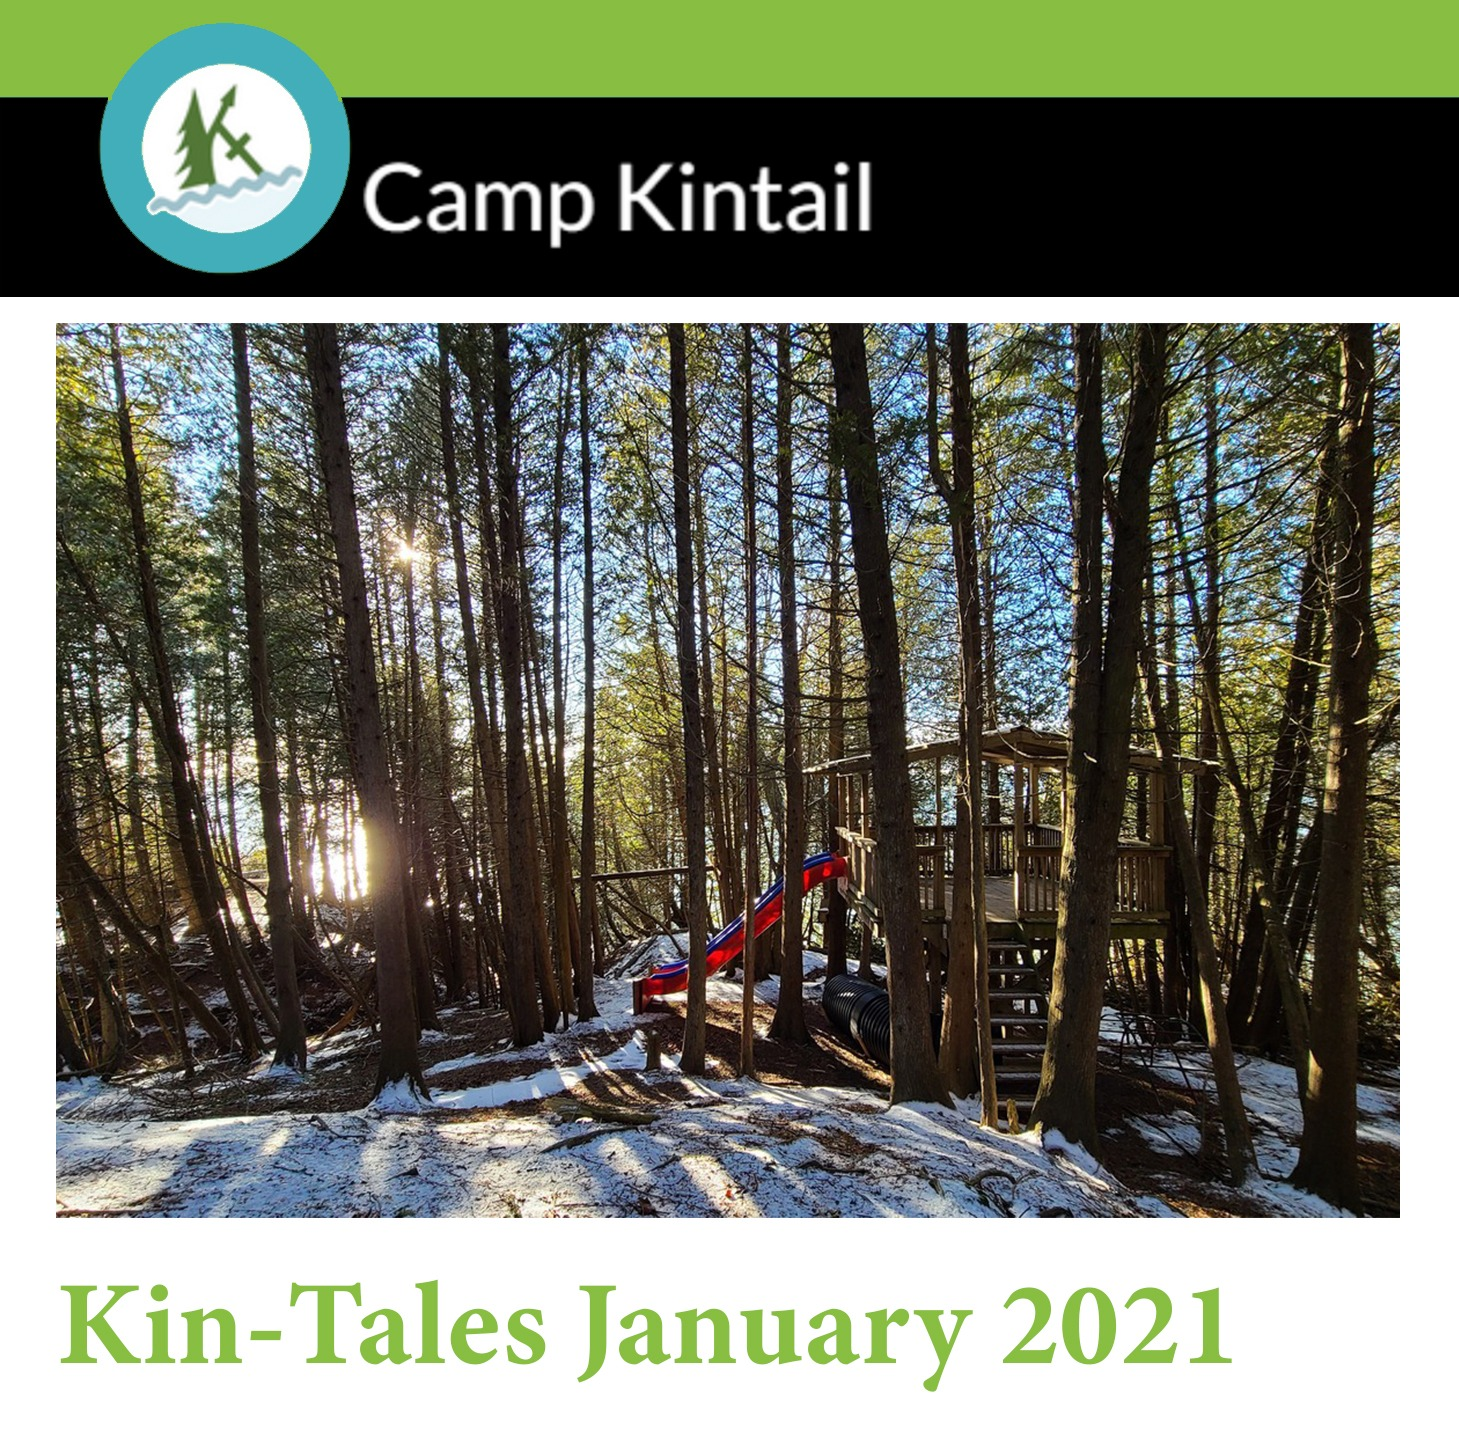 Title Text: Kin-Tales January 2021. Image: Snowy cedar tree forest.